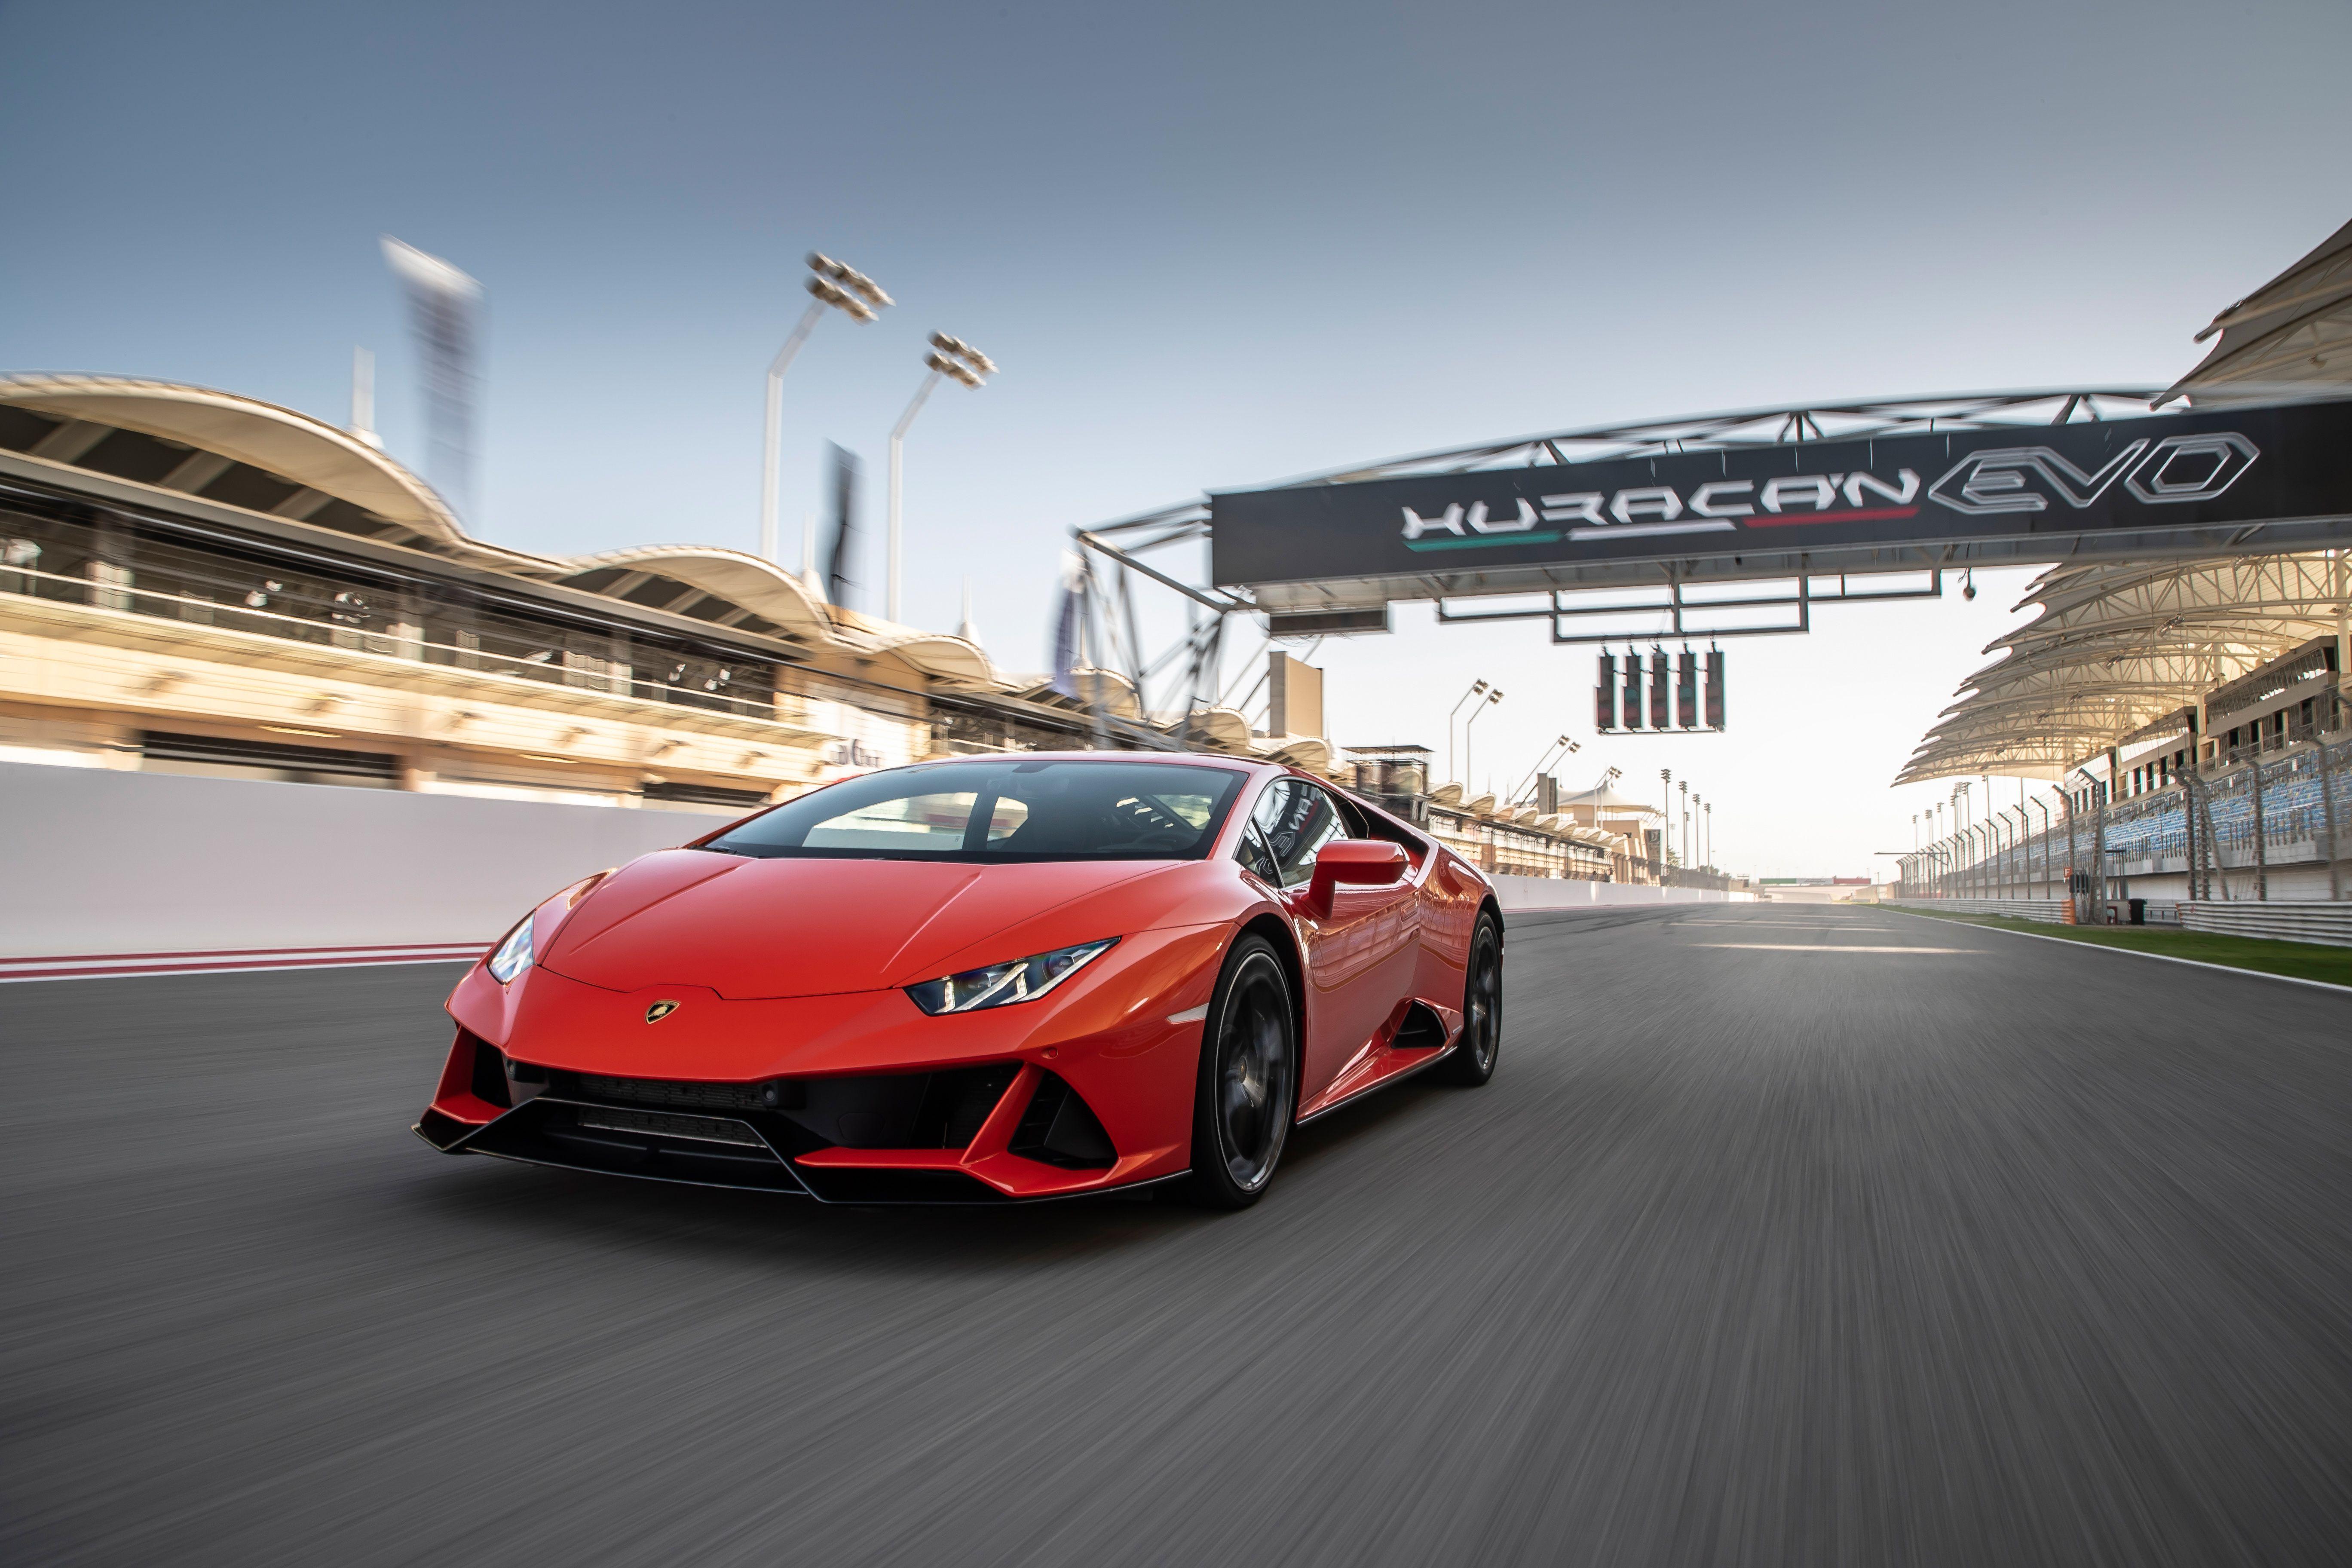 2020 Lamborghini Huracan Reviews Lamborghini Huracan Price Photos